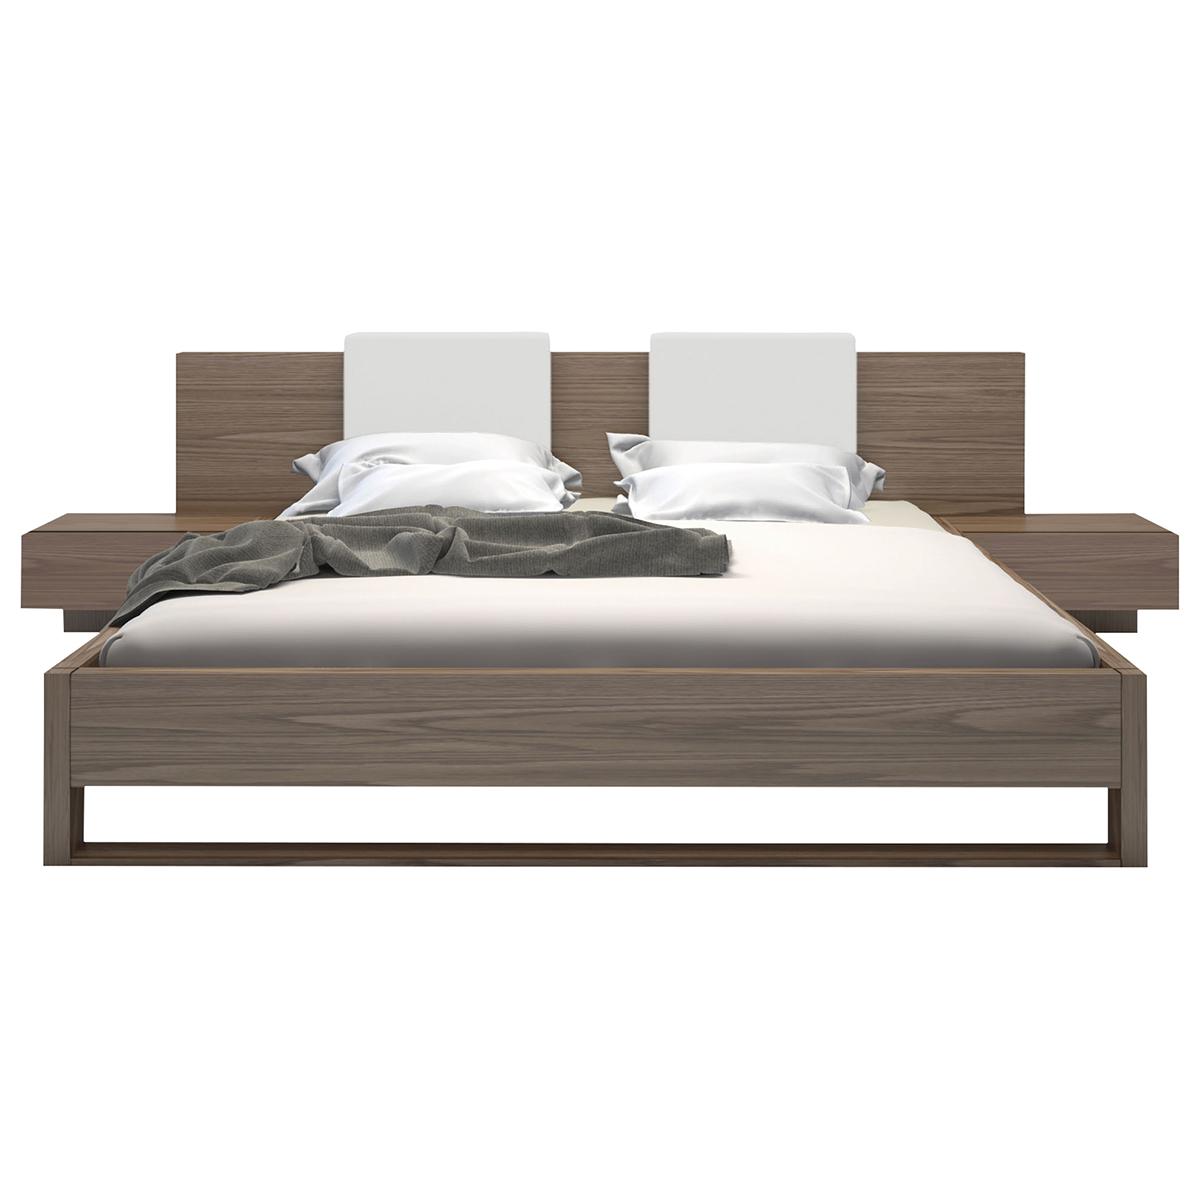 monica bed - Modern Bed Frames